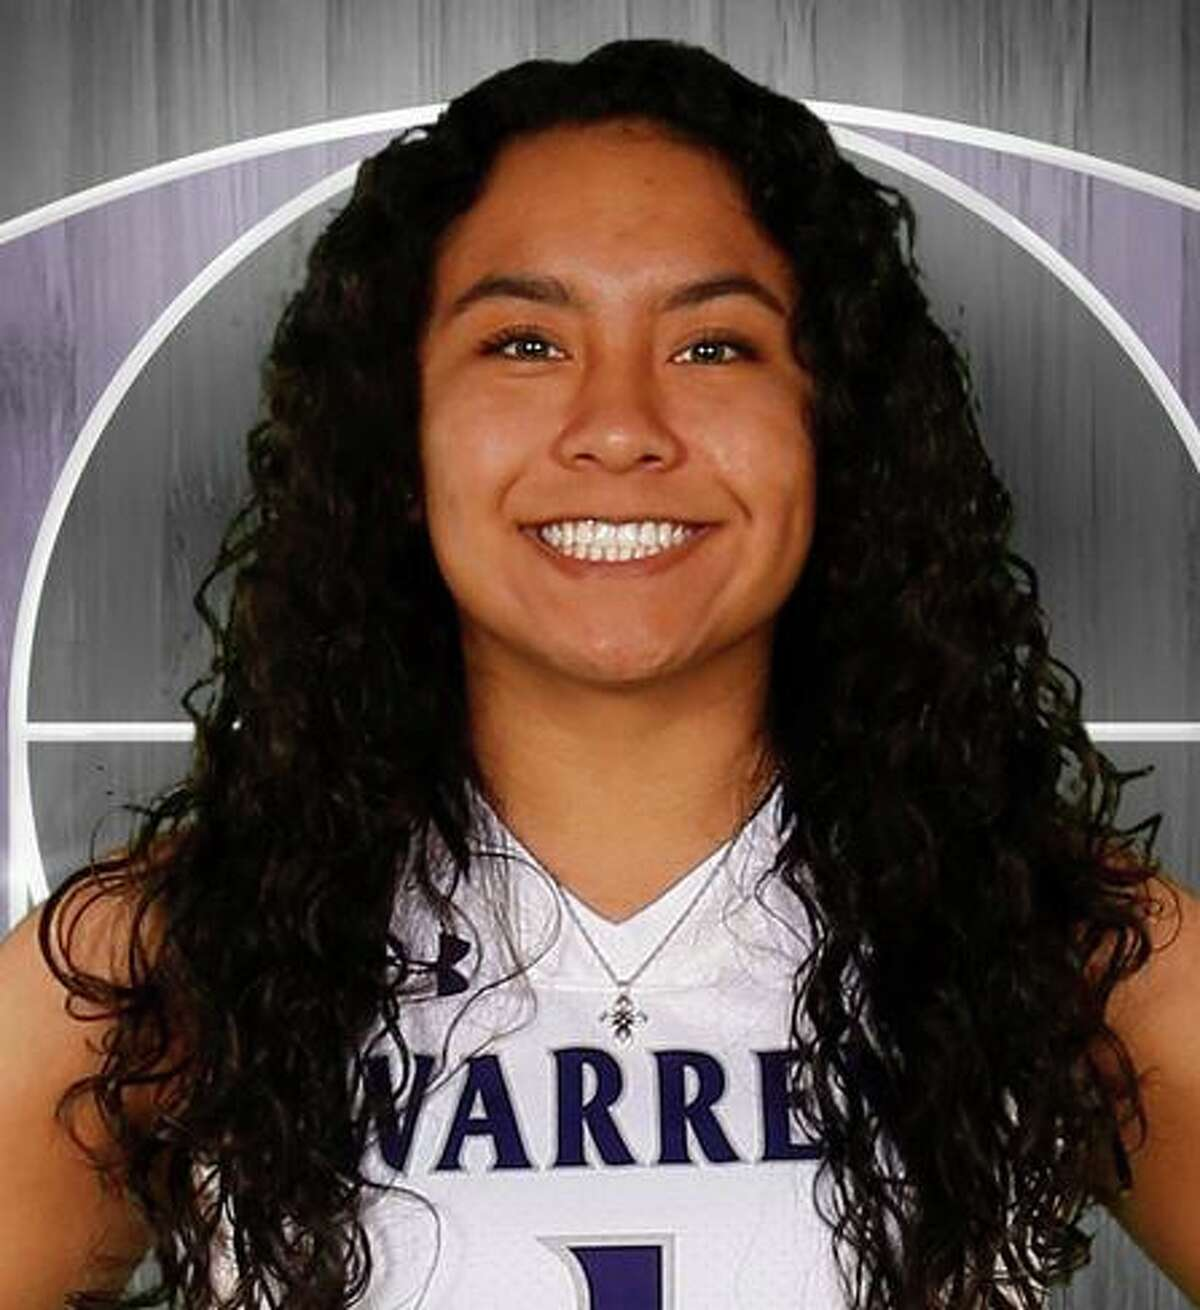 Sophomore Vivianna Solis is a guard for Warren